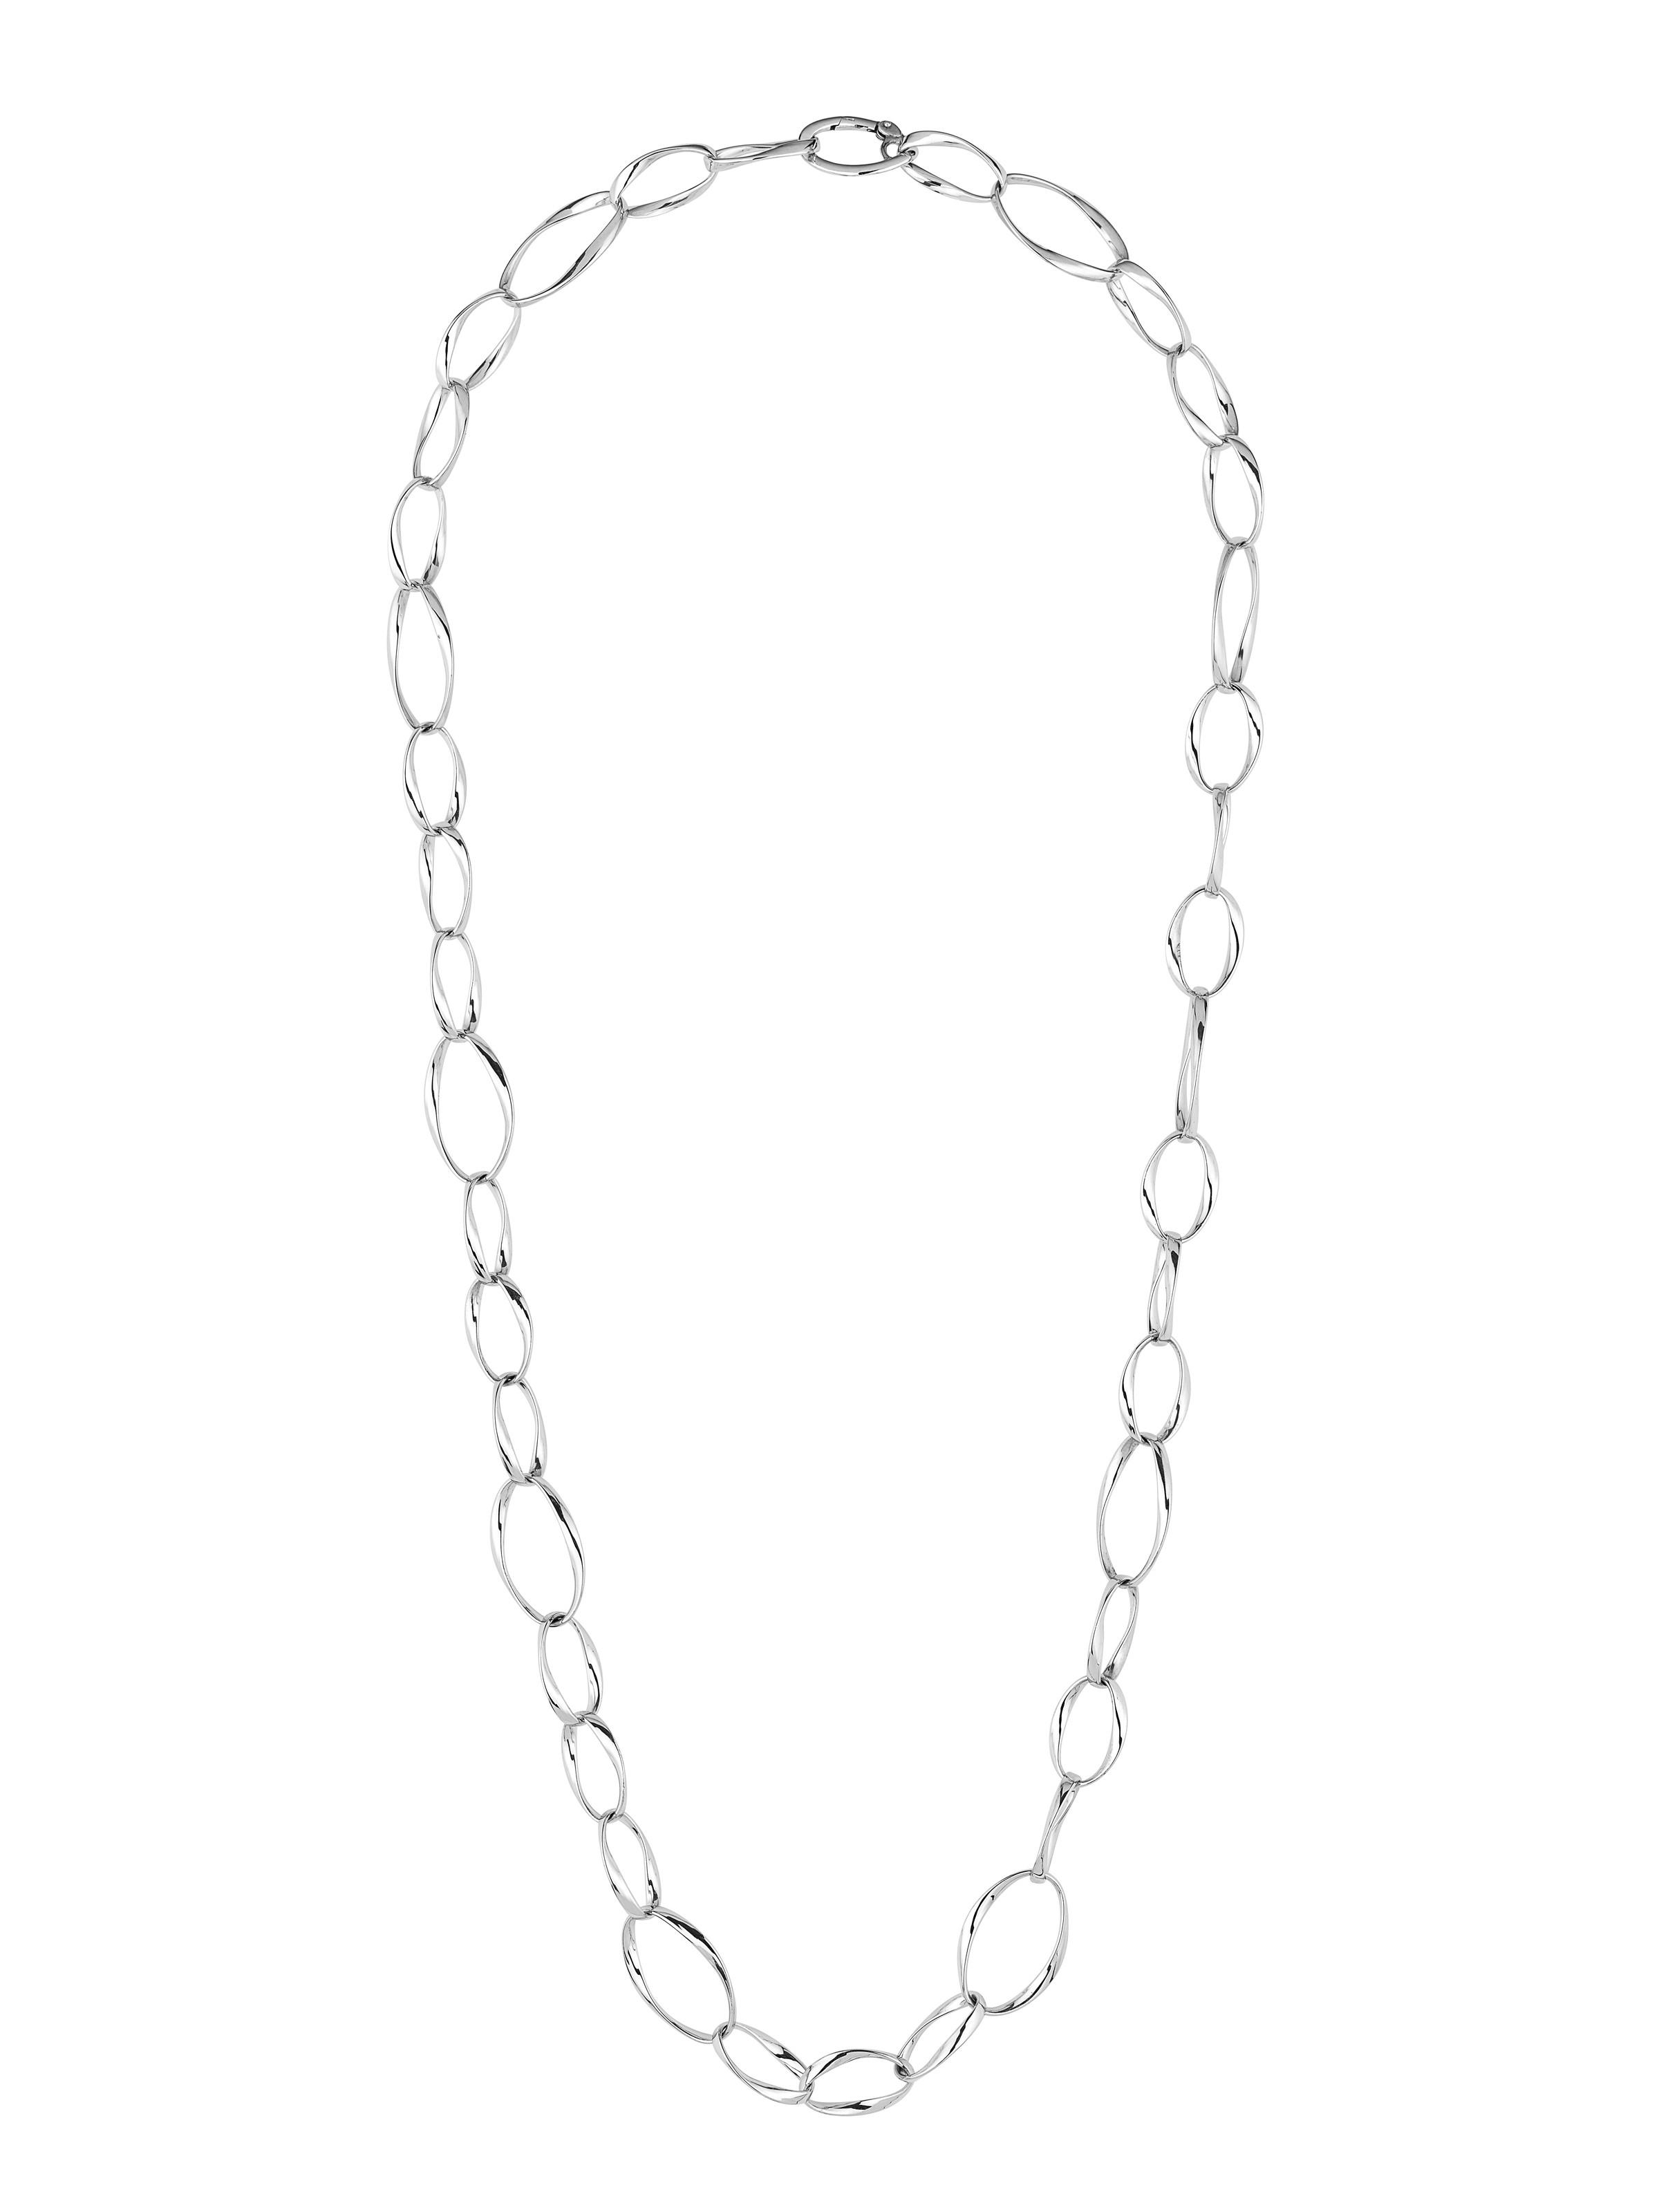 Rhythmus necklace